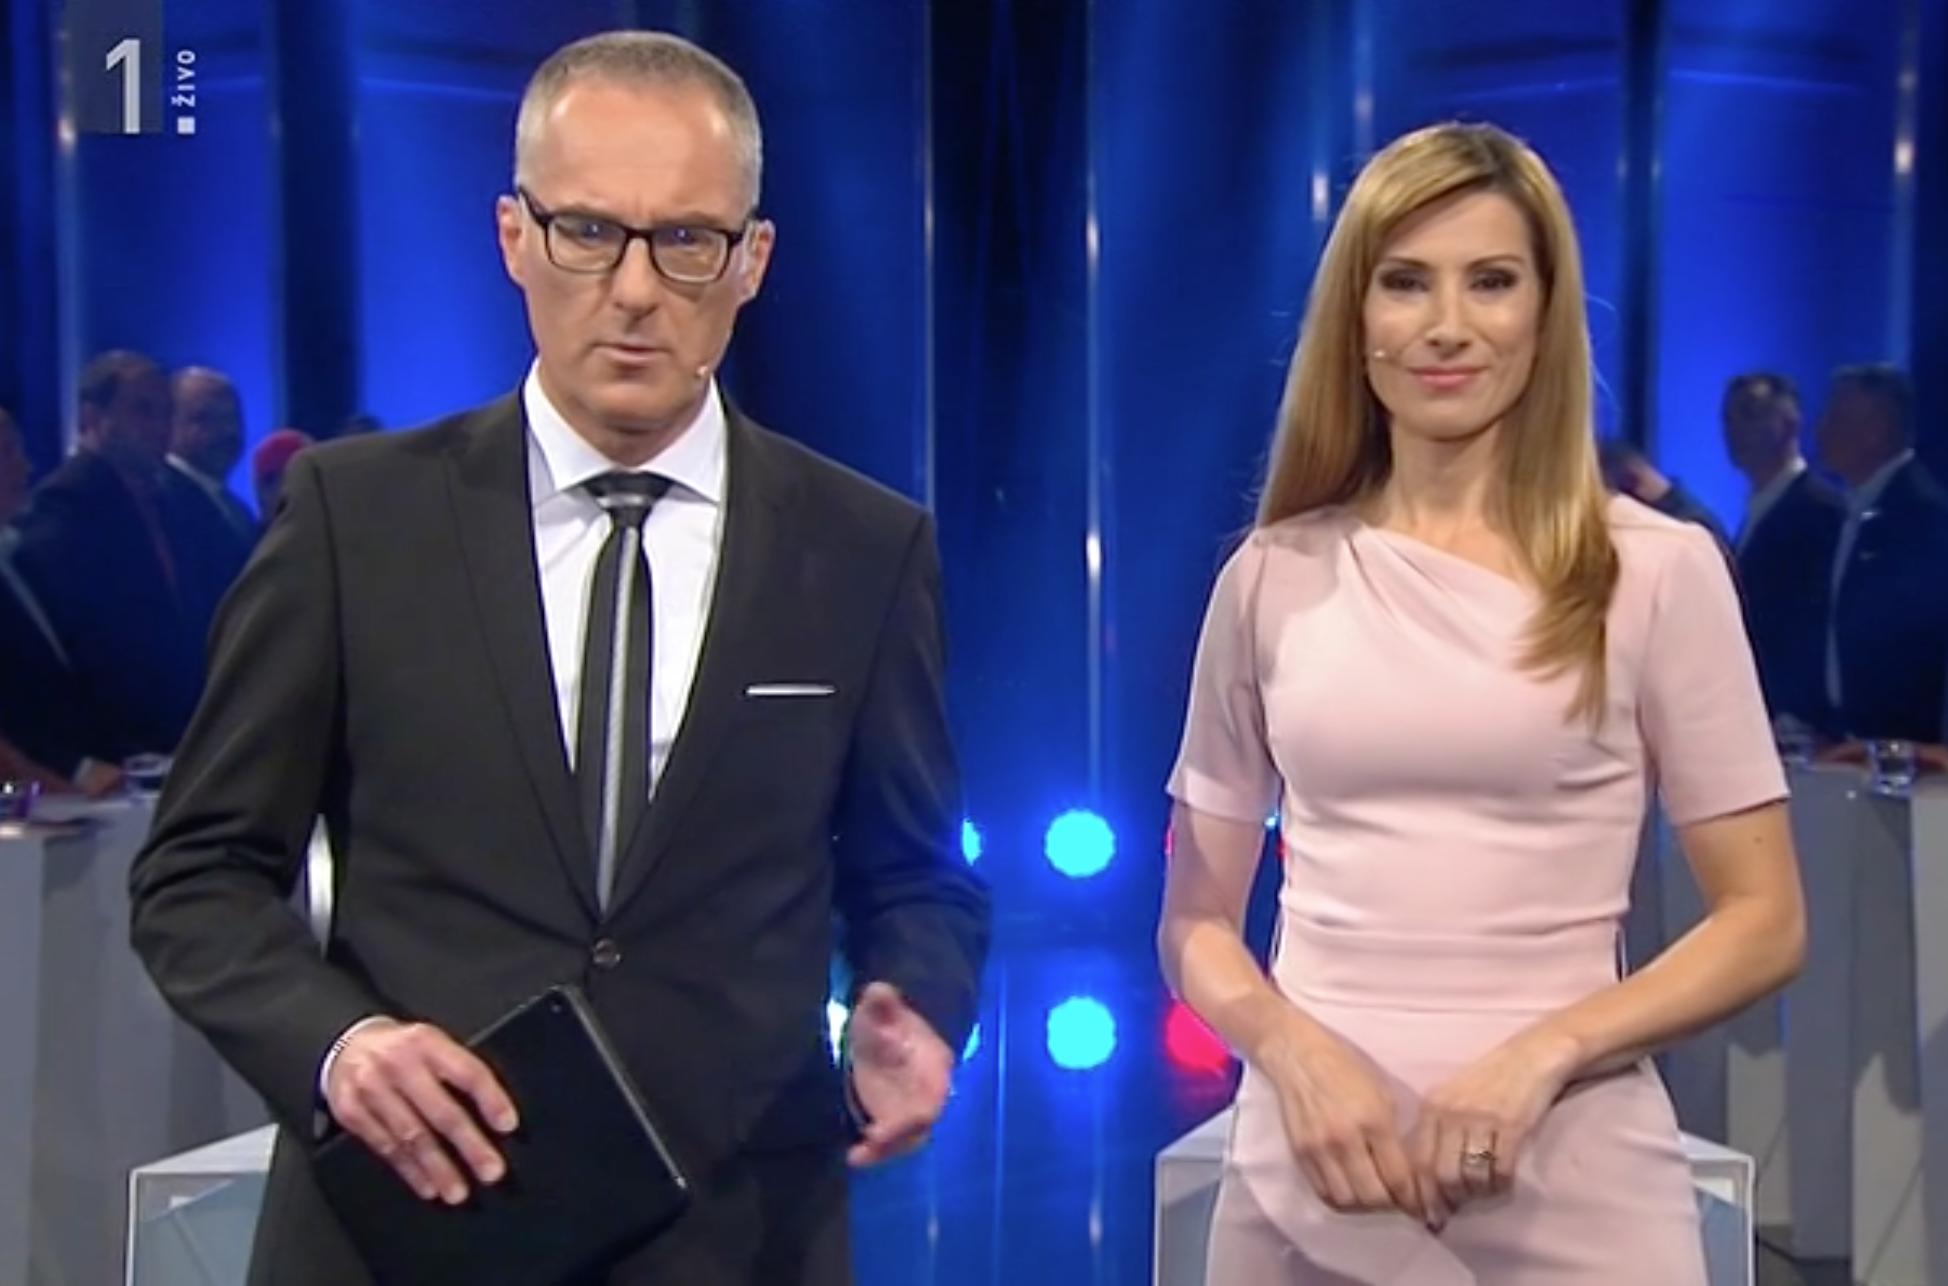 Soočenje na javni RTV Slovenija – Sramota za RTV